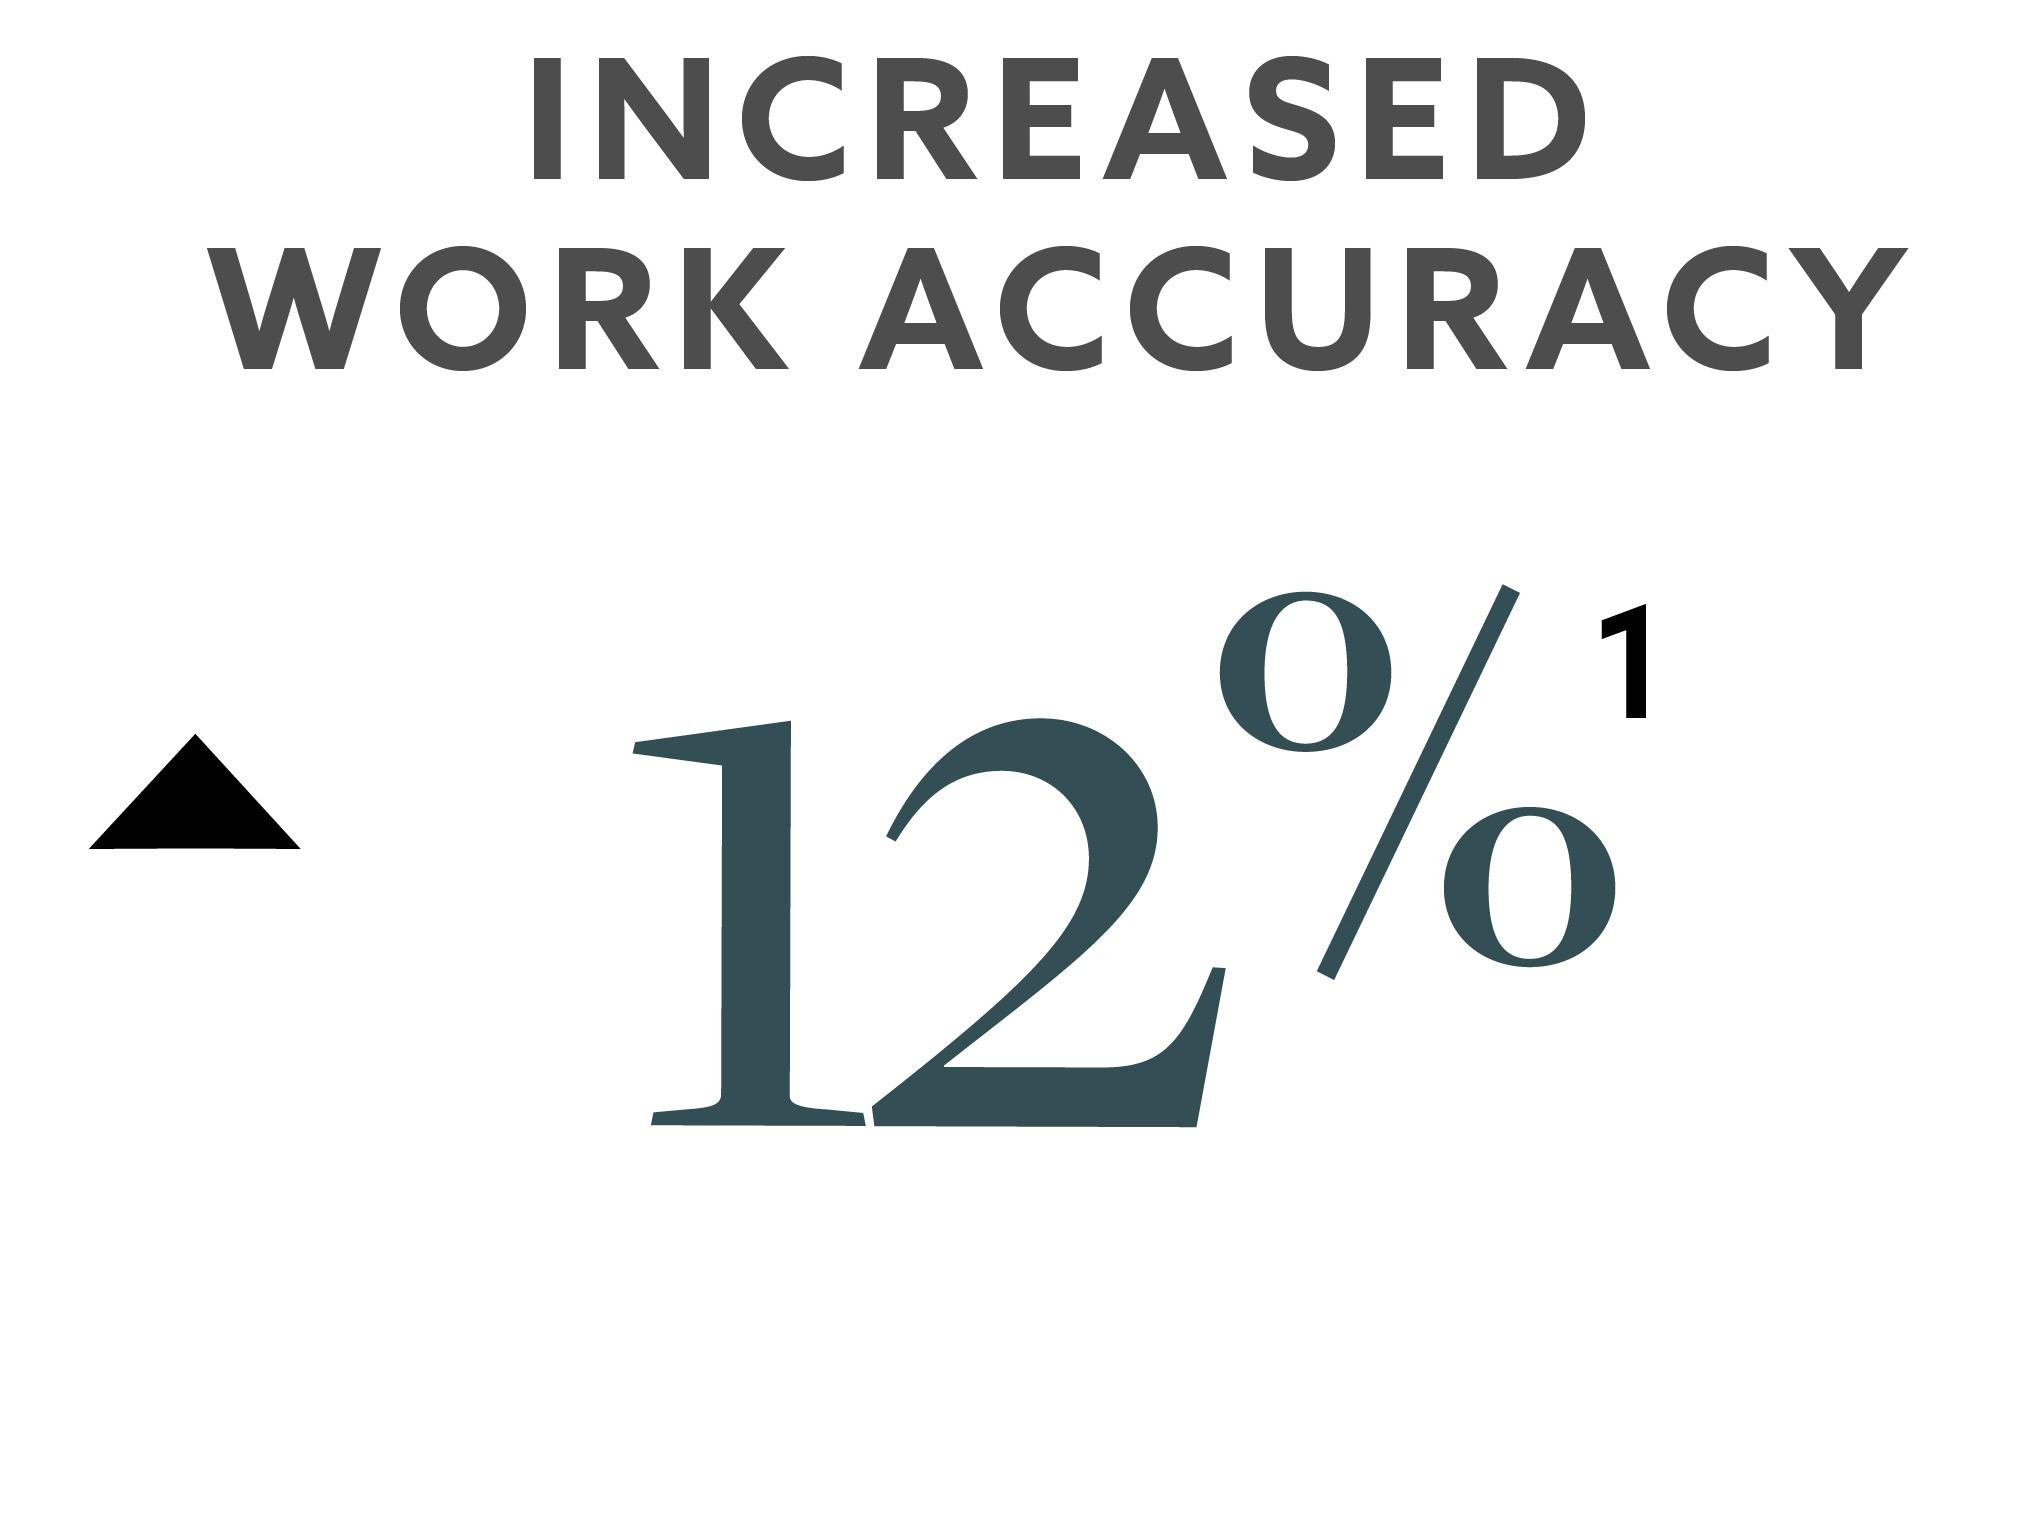 Increased Work Accuracy